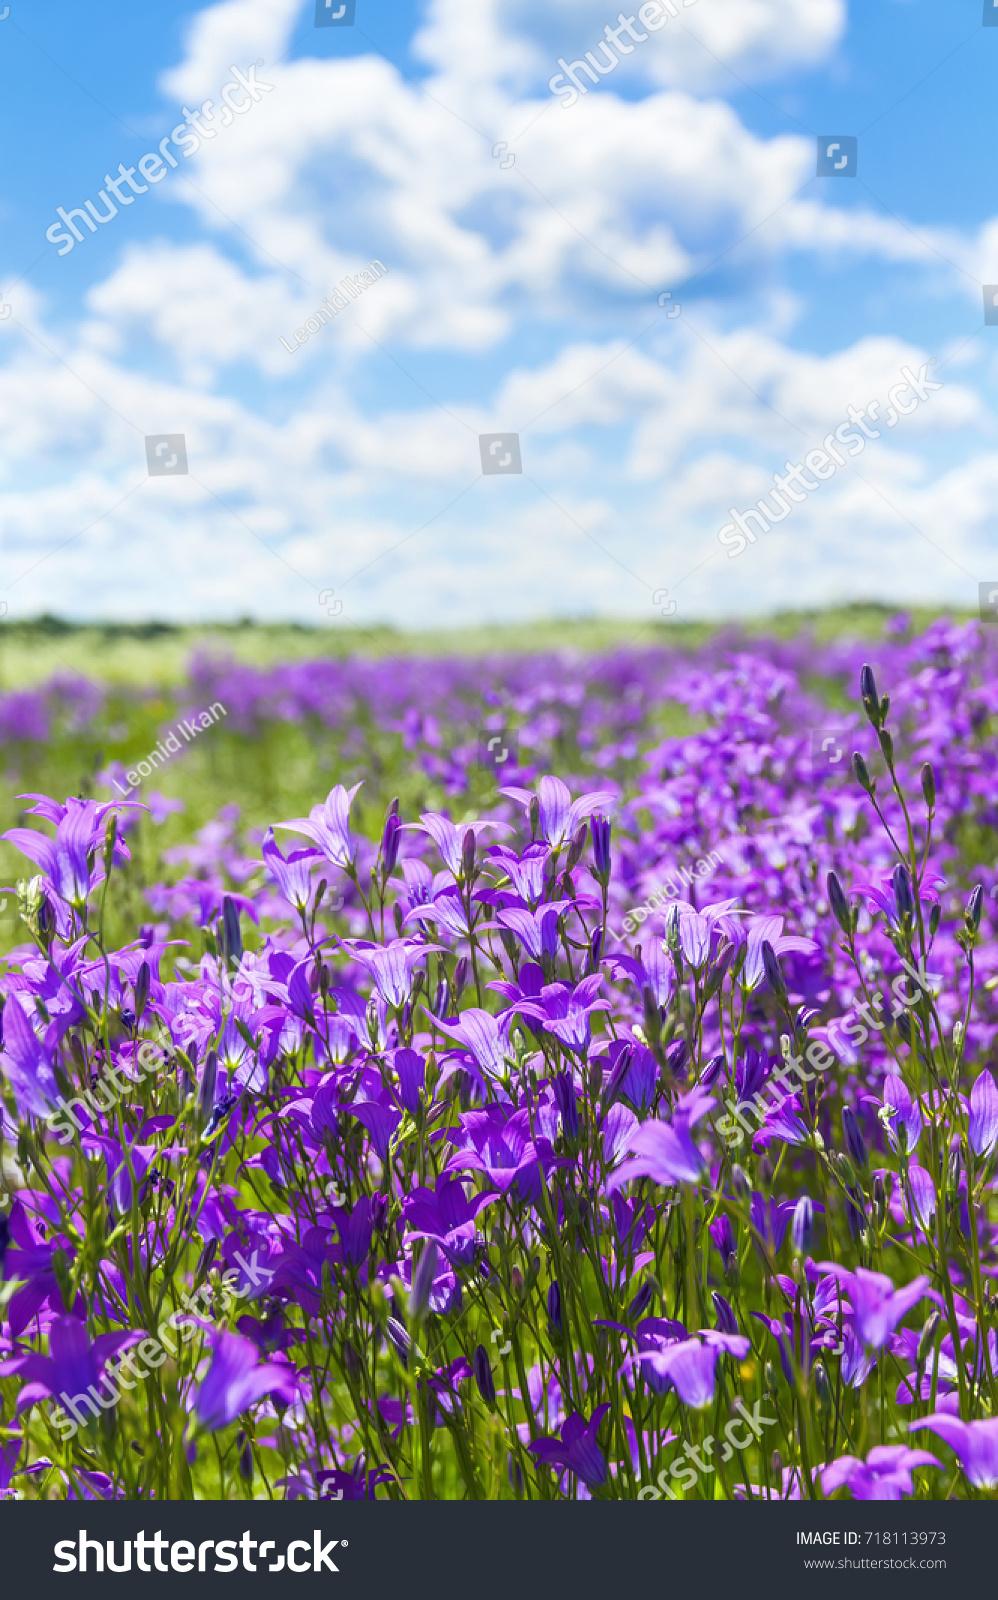 Summer Bright Scenery Field Beautiful Flowers Stock Photo Edit Now